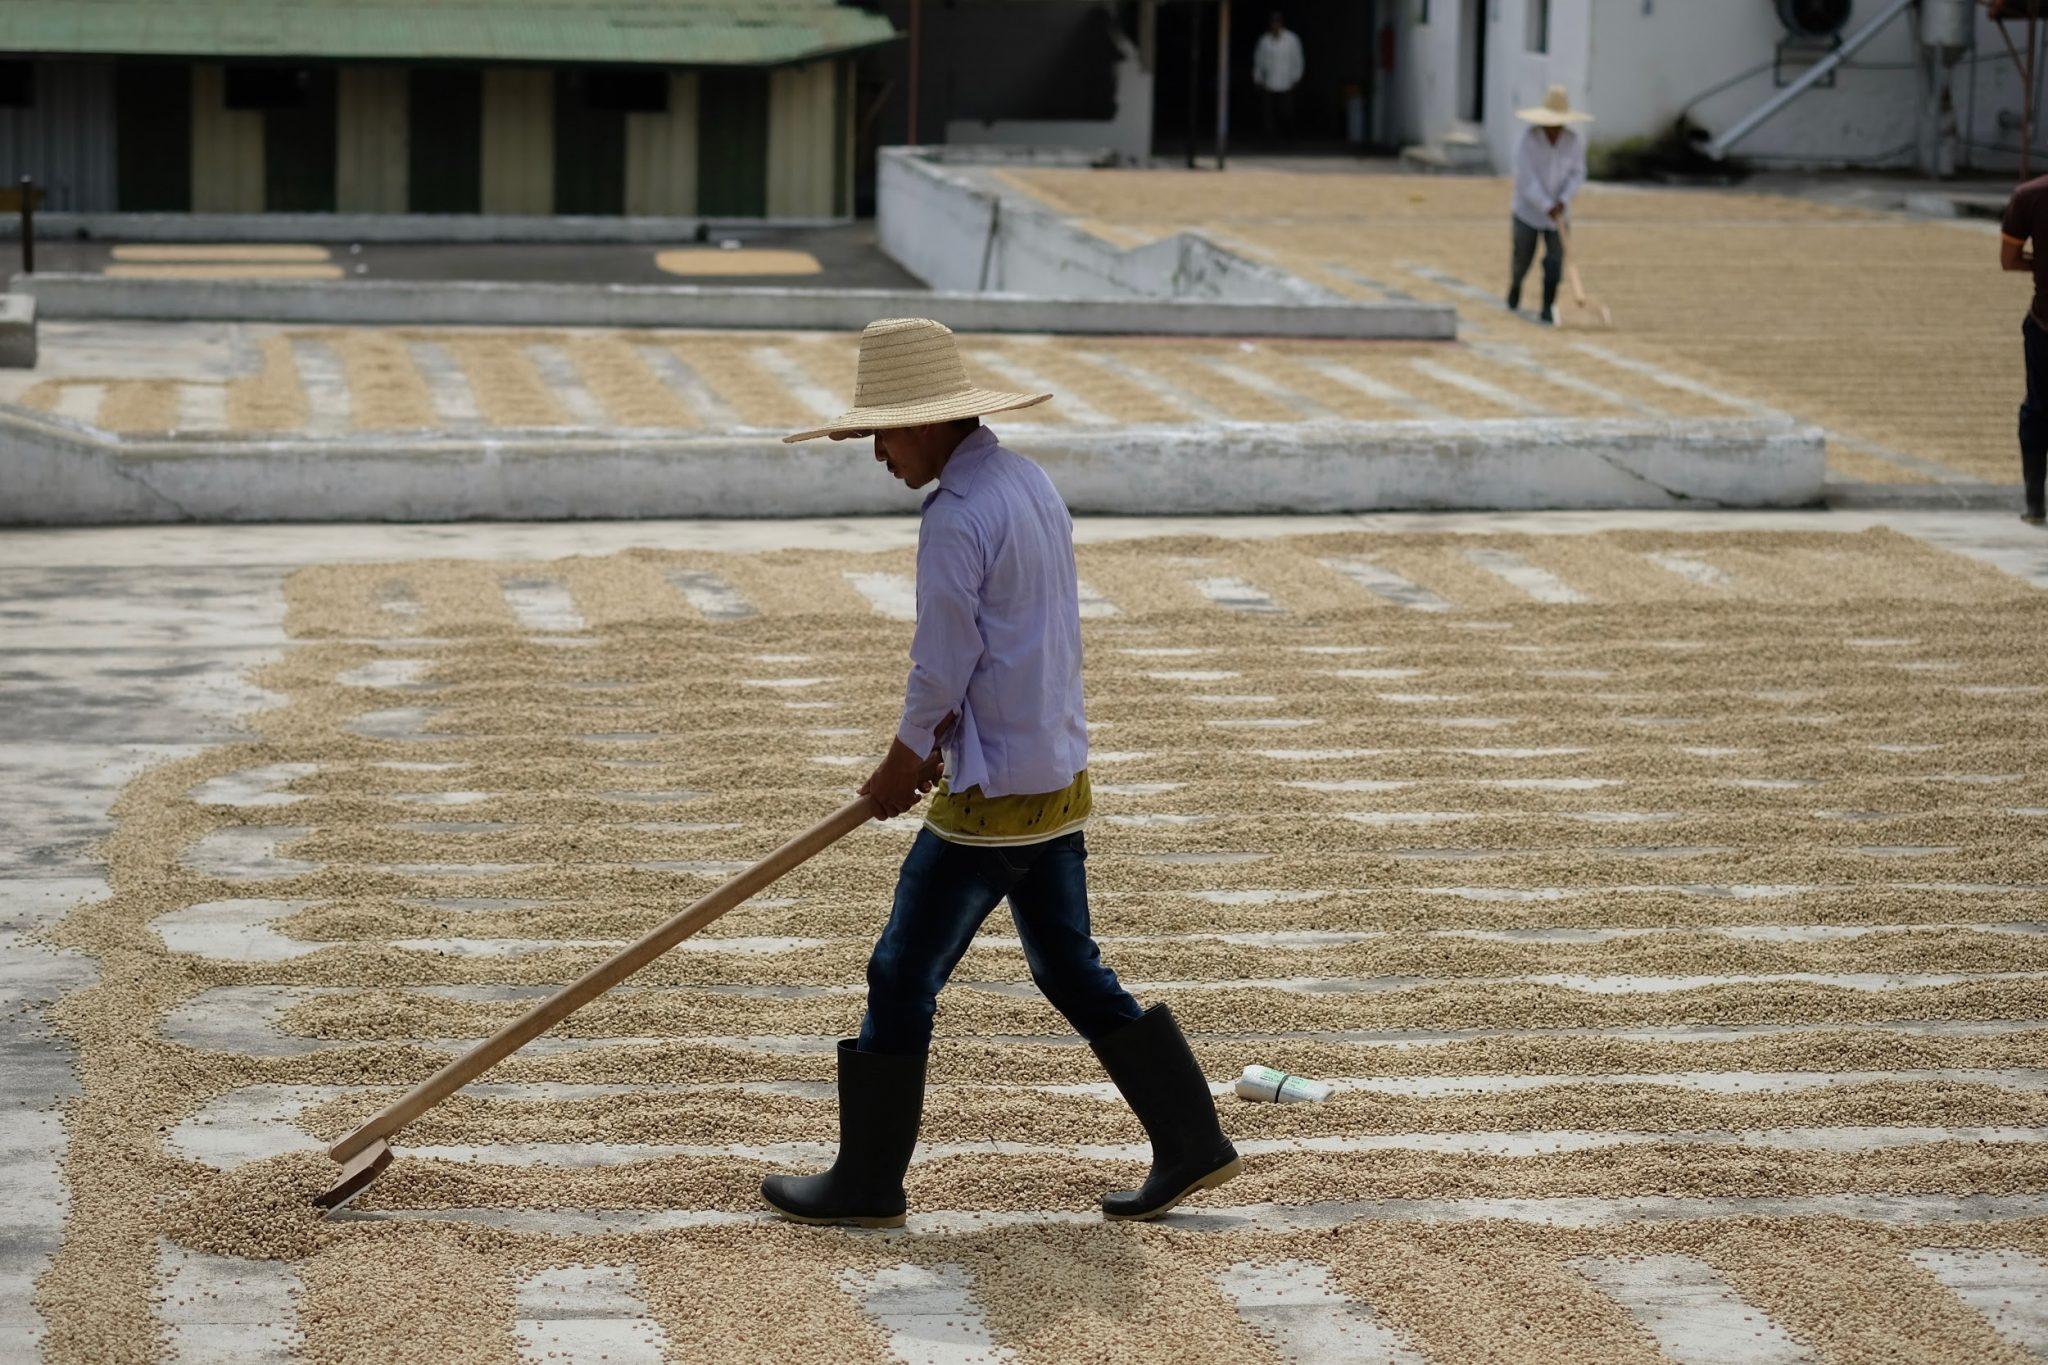 a coffee farmer rakes drying coffee on a patio